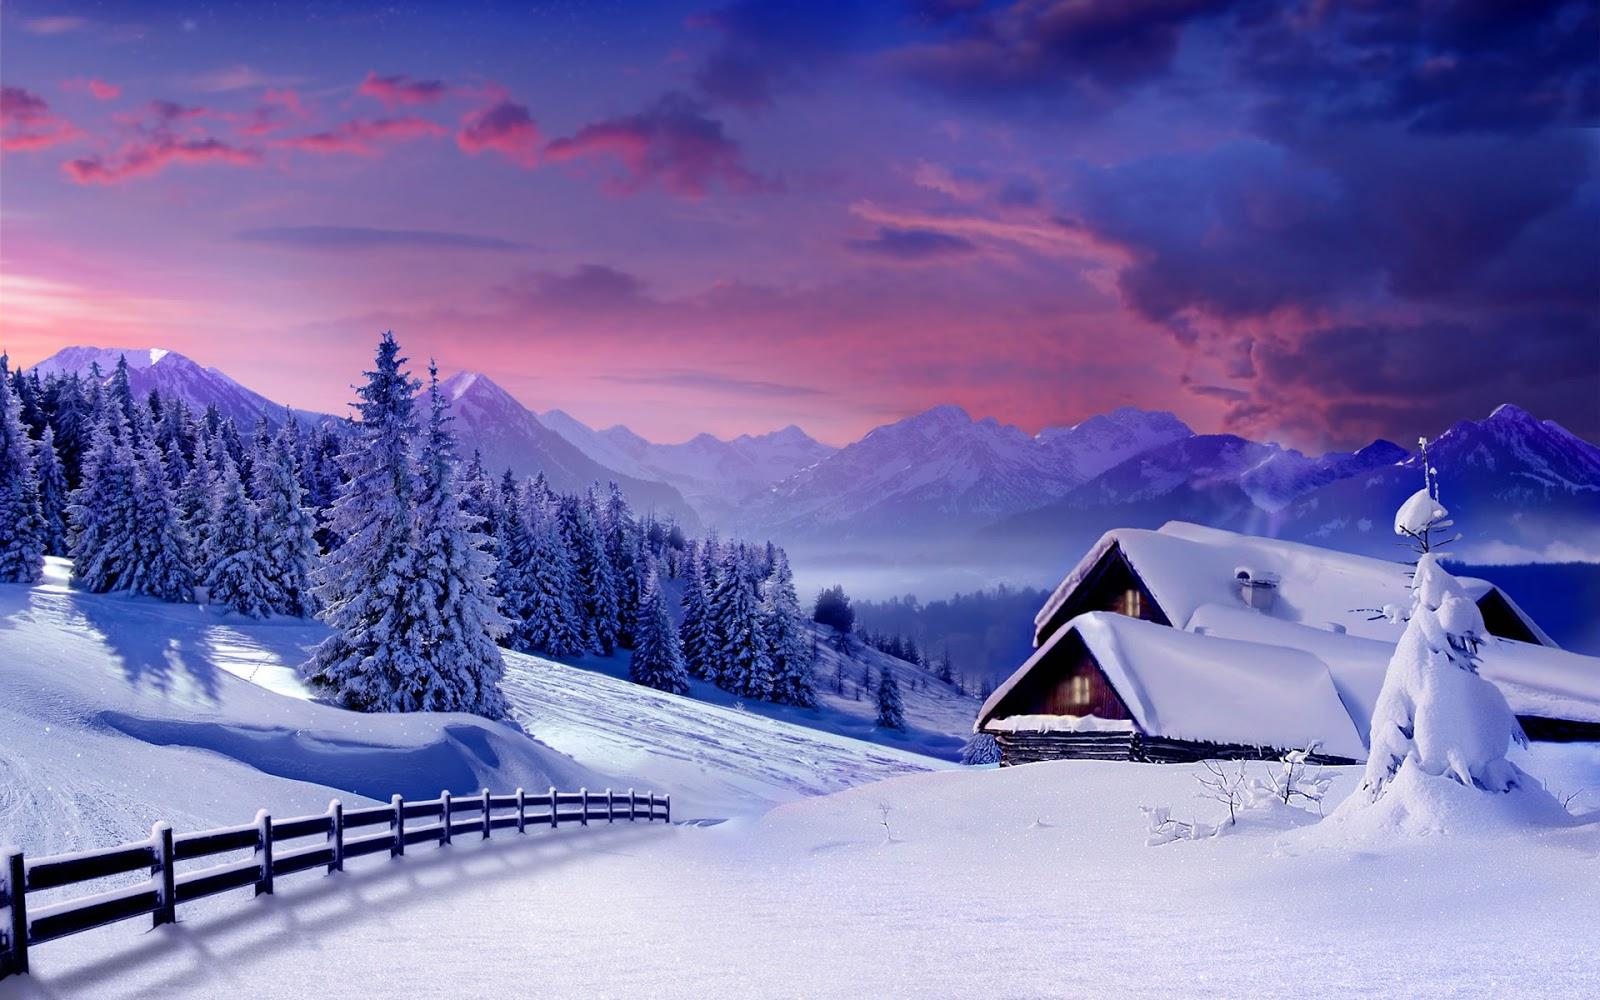 Gallery Wallpaper Winter